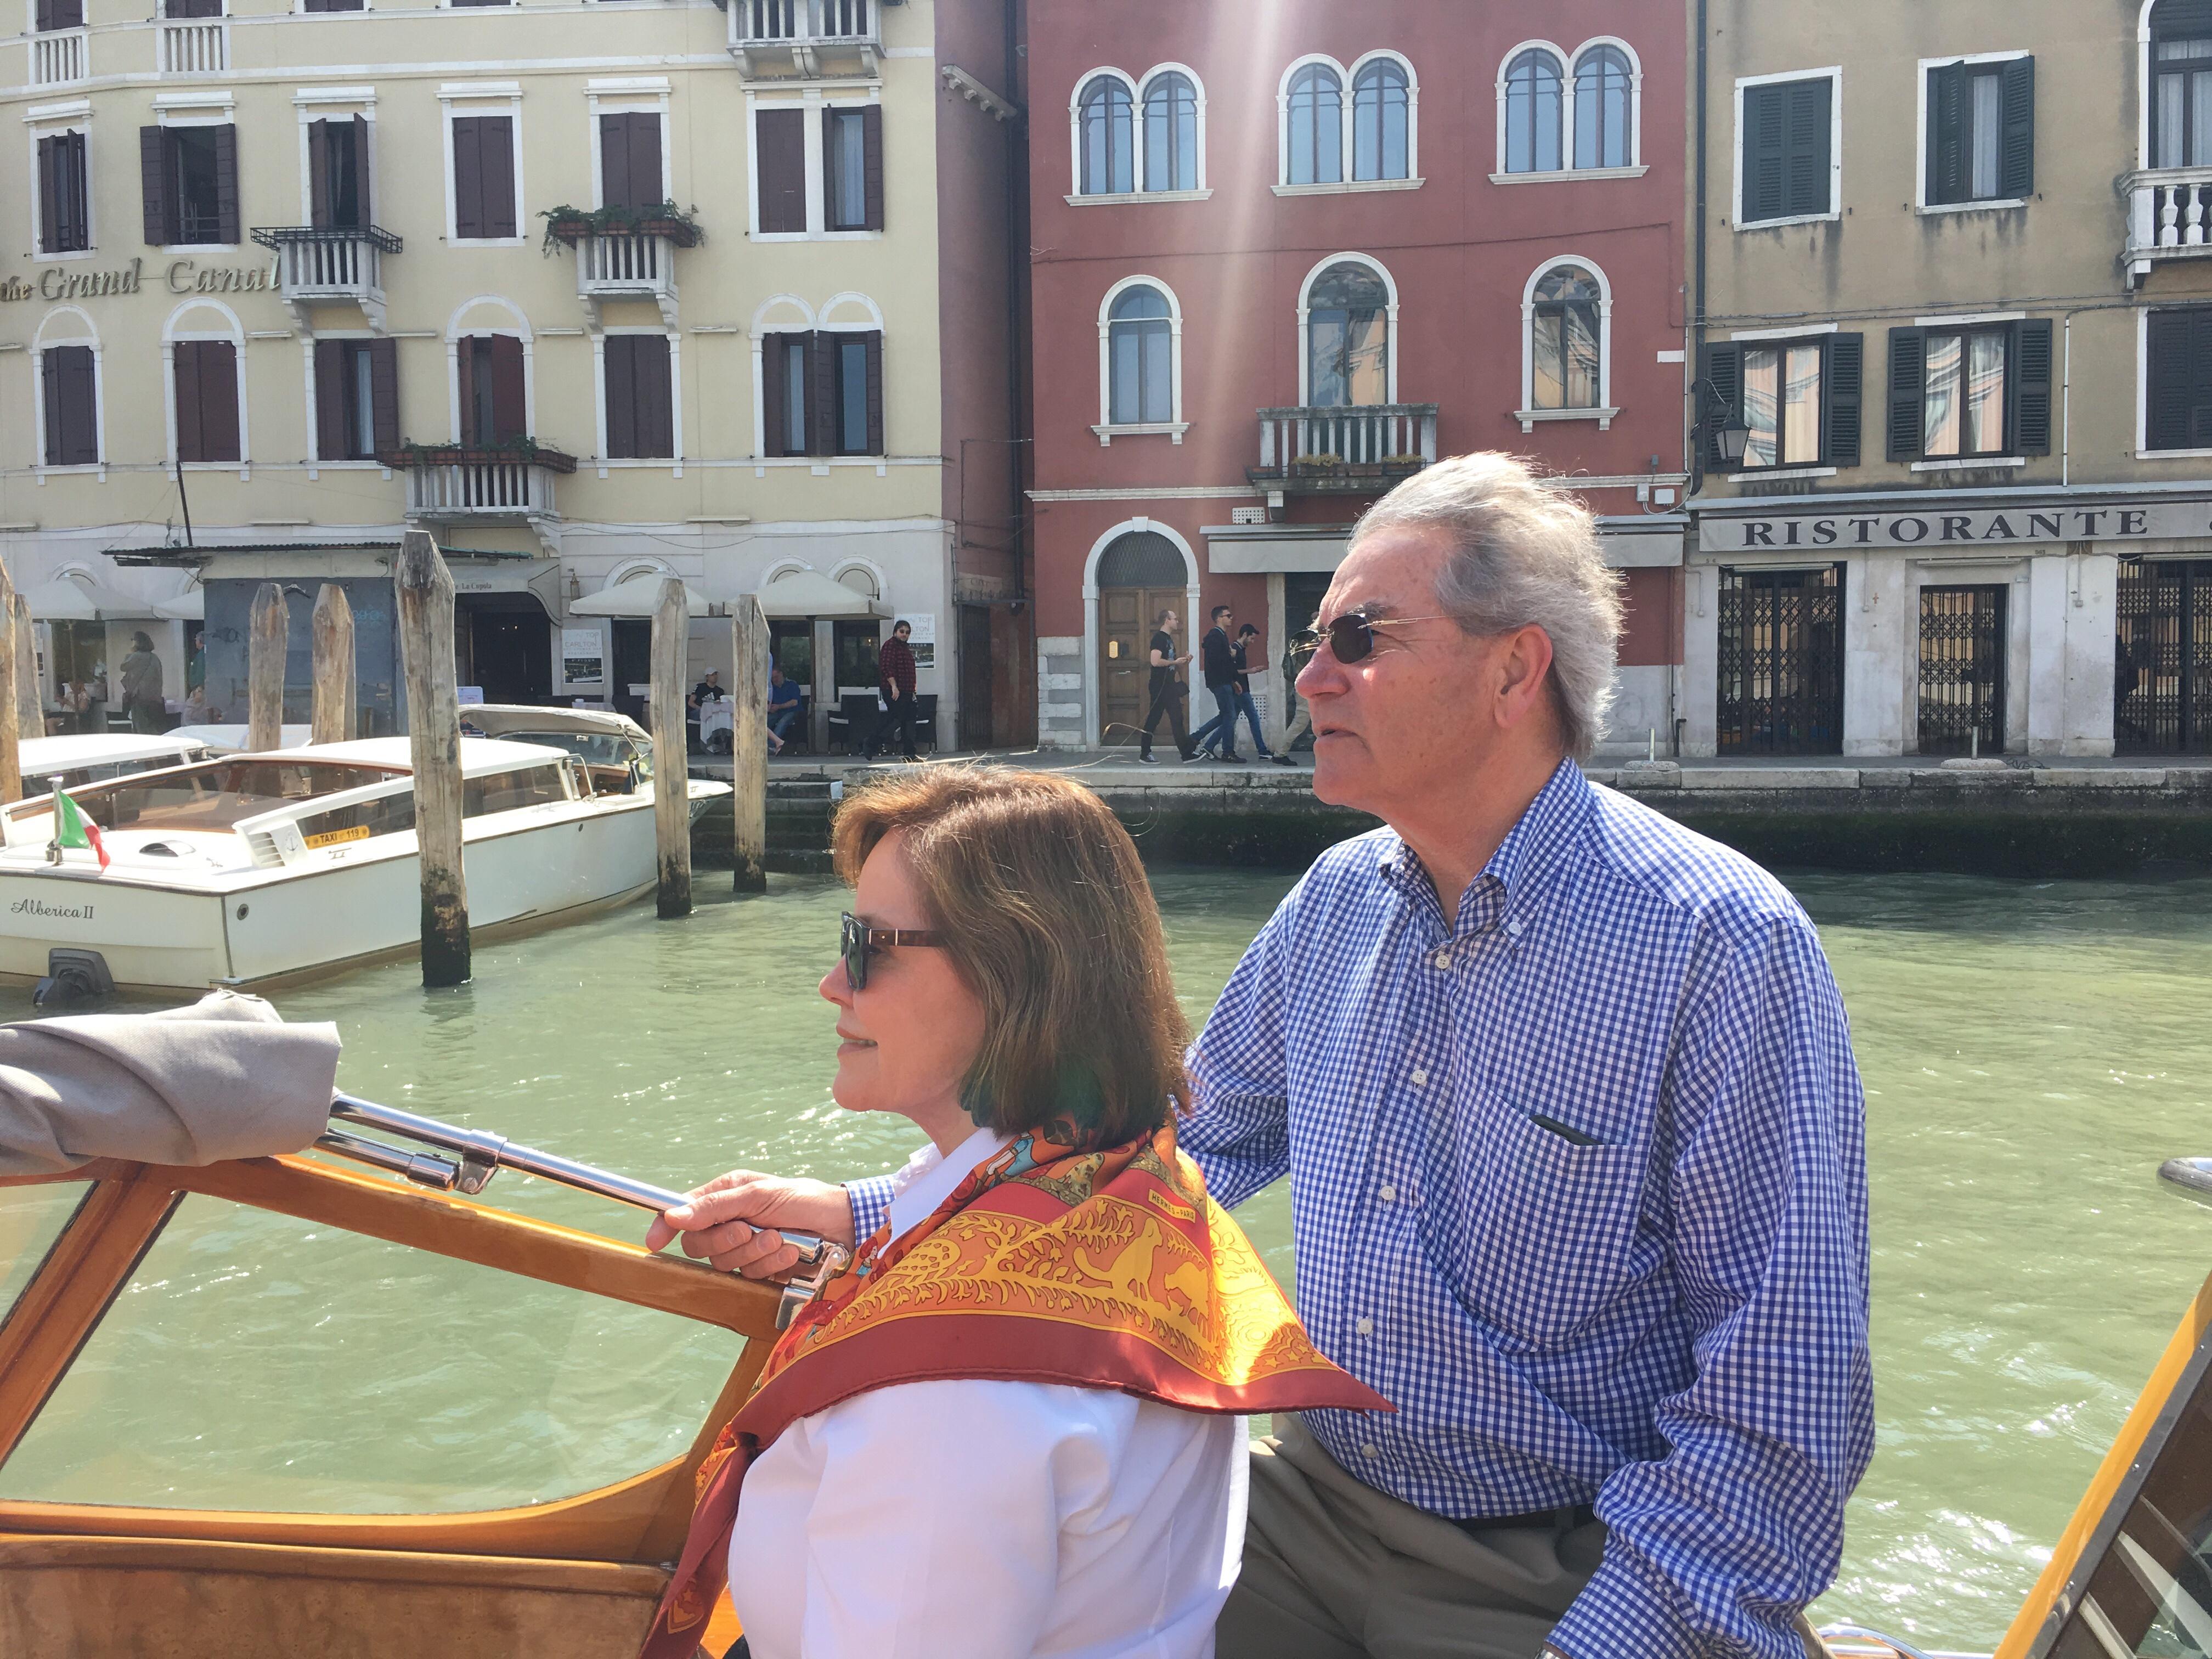 Grand Canal - Venice enjoying the www.grand-tourist.com experience.